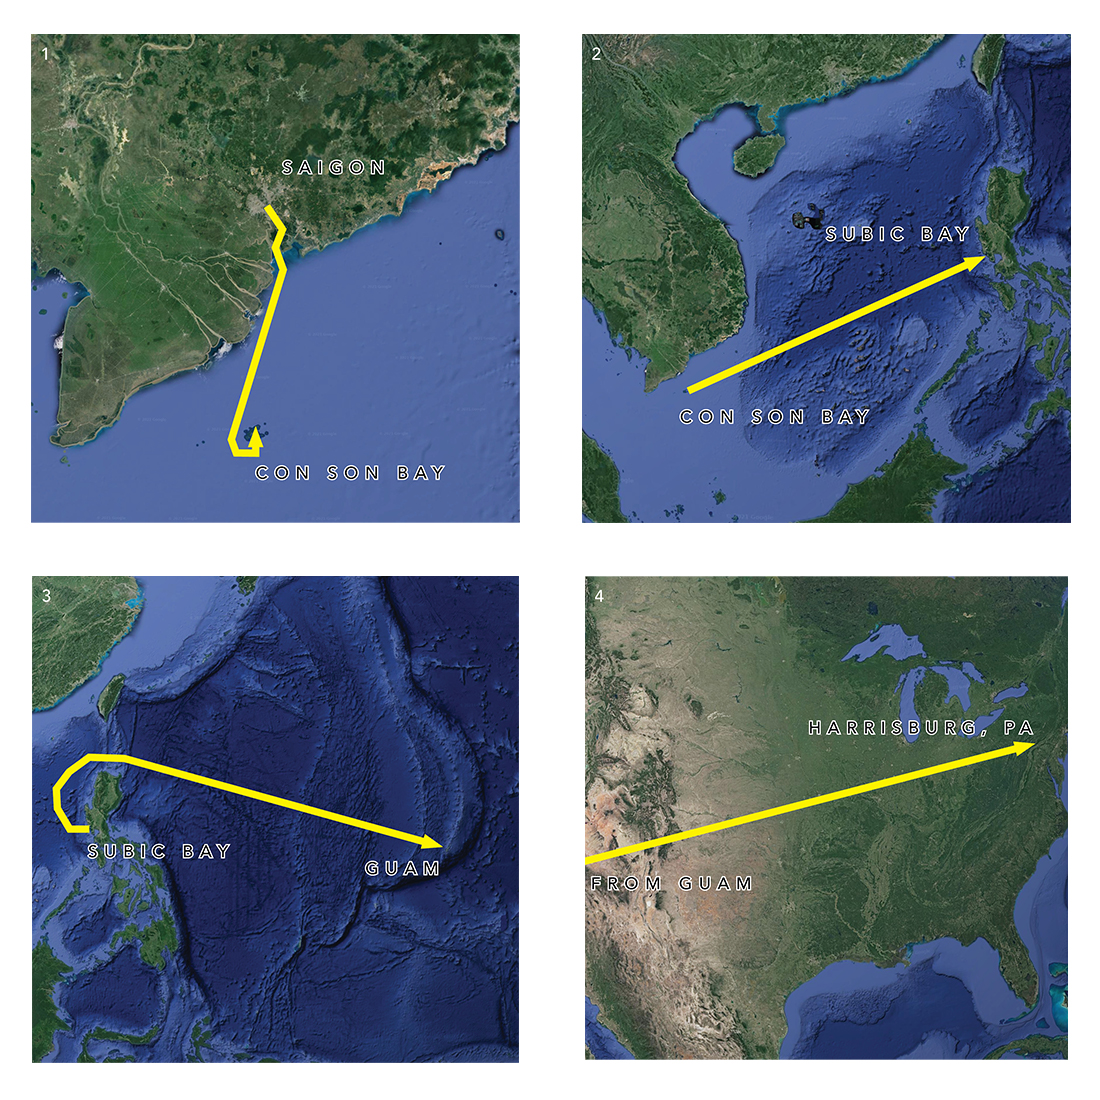 Thau's journey from Vietnam to Atlanta.